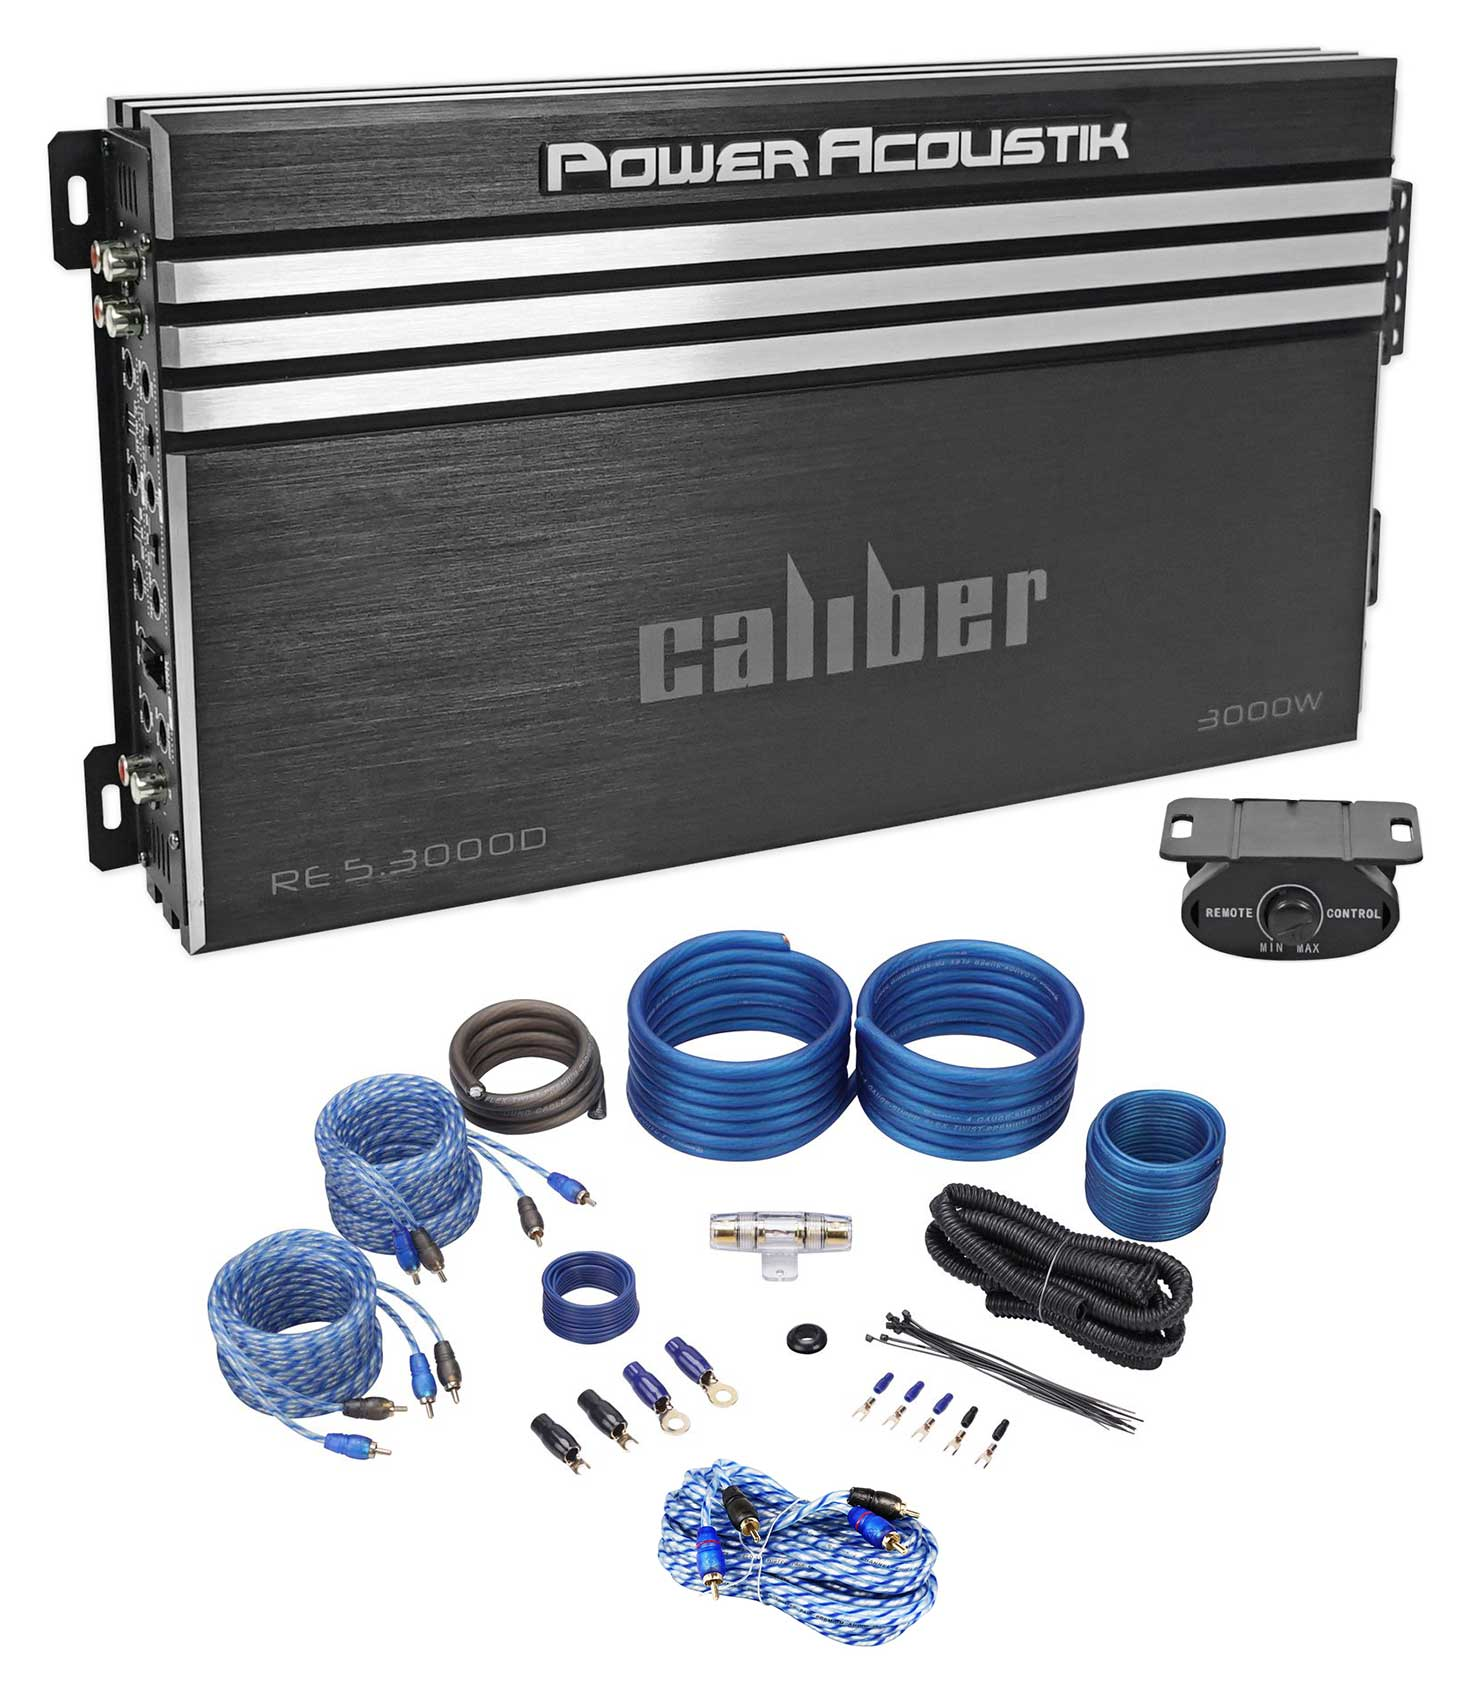 medium resolution of power acoustik re5 3000d 3000w 5 channel car audio amplifier class a power acoustik akit8 amplifier wiring kit 8gauge walmartcom